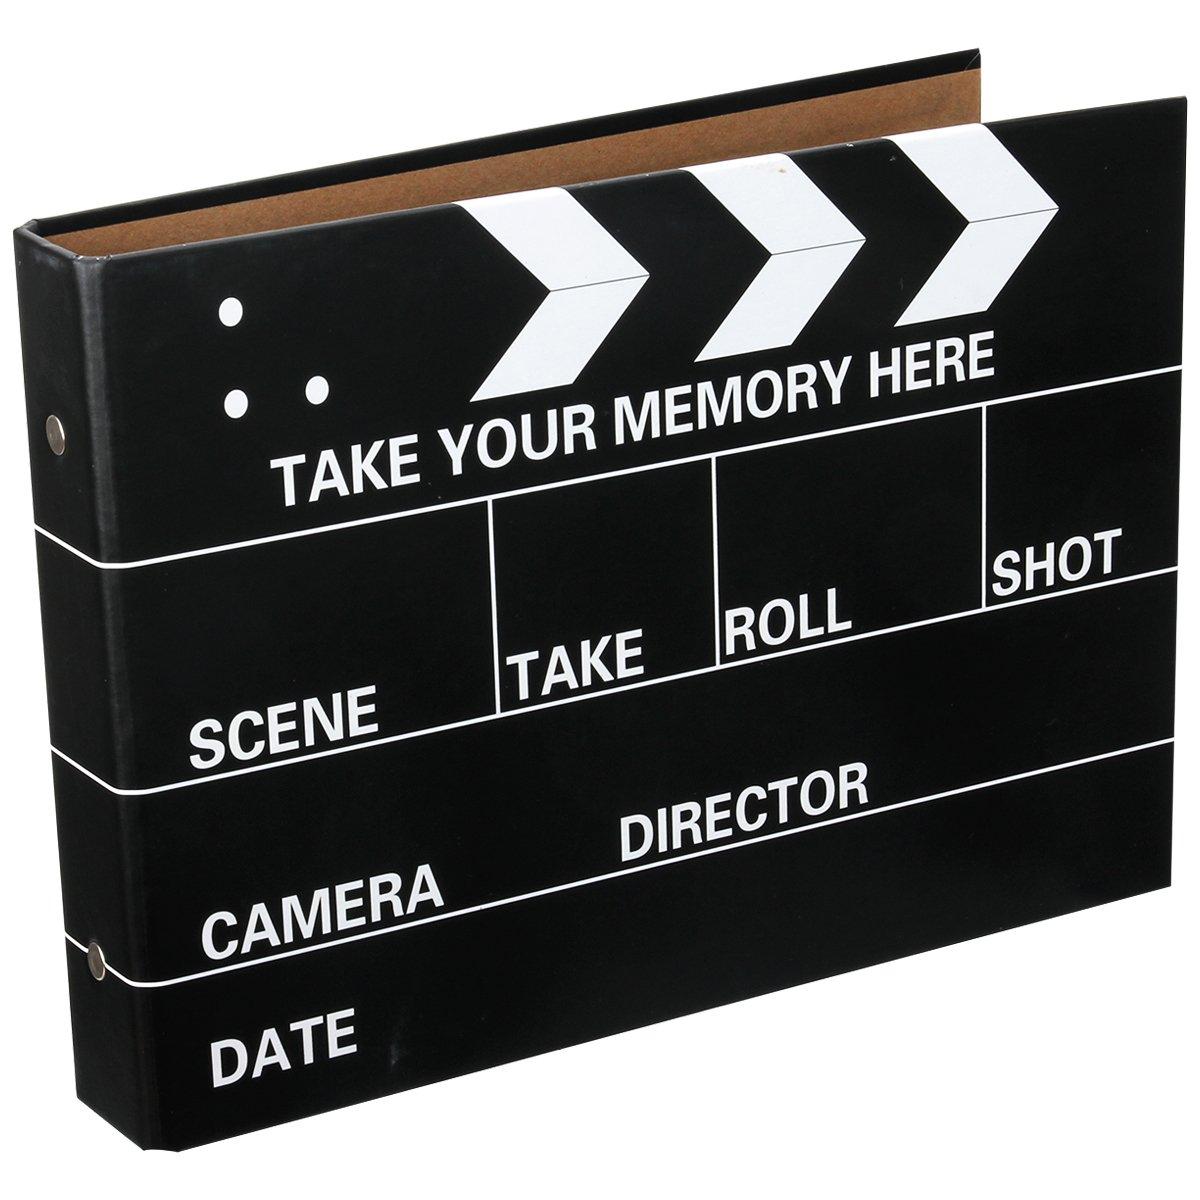 [Fujifilm Instax Mini Foto Álbum] - CAIUL 50 Páginas DIY Álbum para Fujifilm Instax Mini 70 7s 8 8+ 9 25 26 50 90/ Pringo 231/ Instax SP-1/ Polaroid PIC-300P Z2300 Film (Flores) Nodartisan